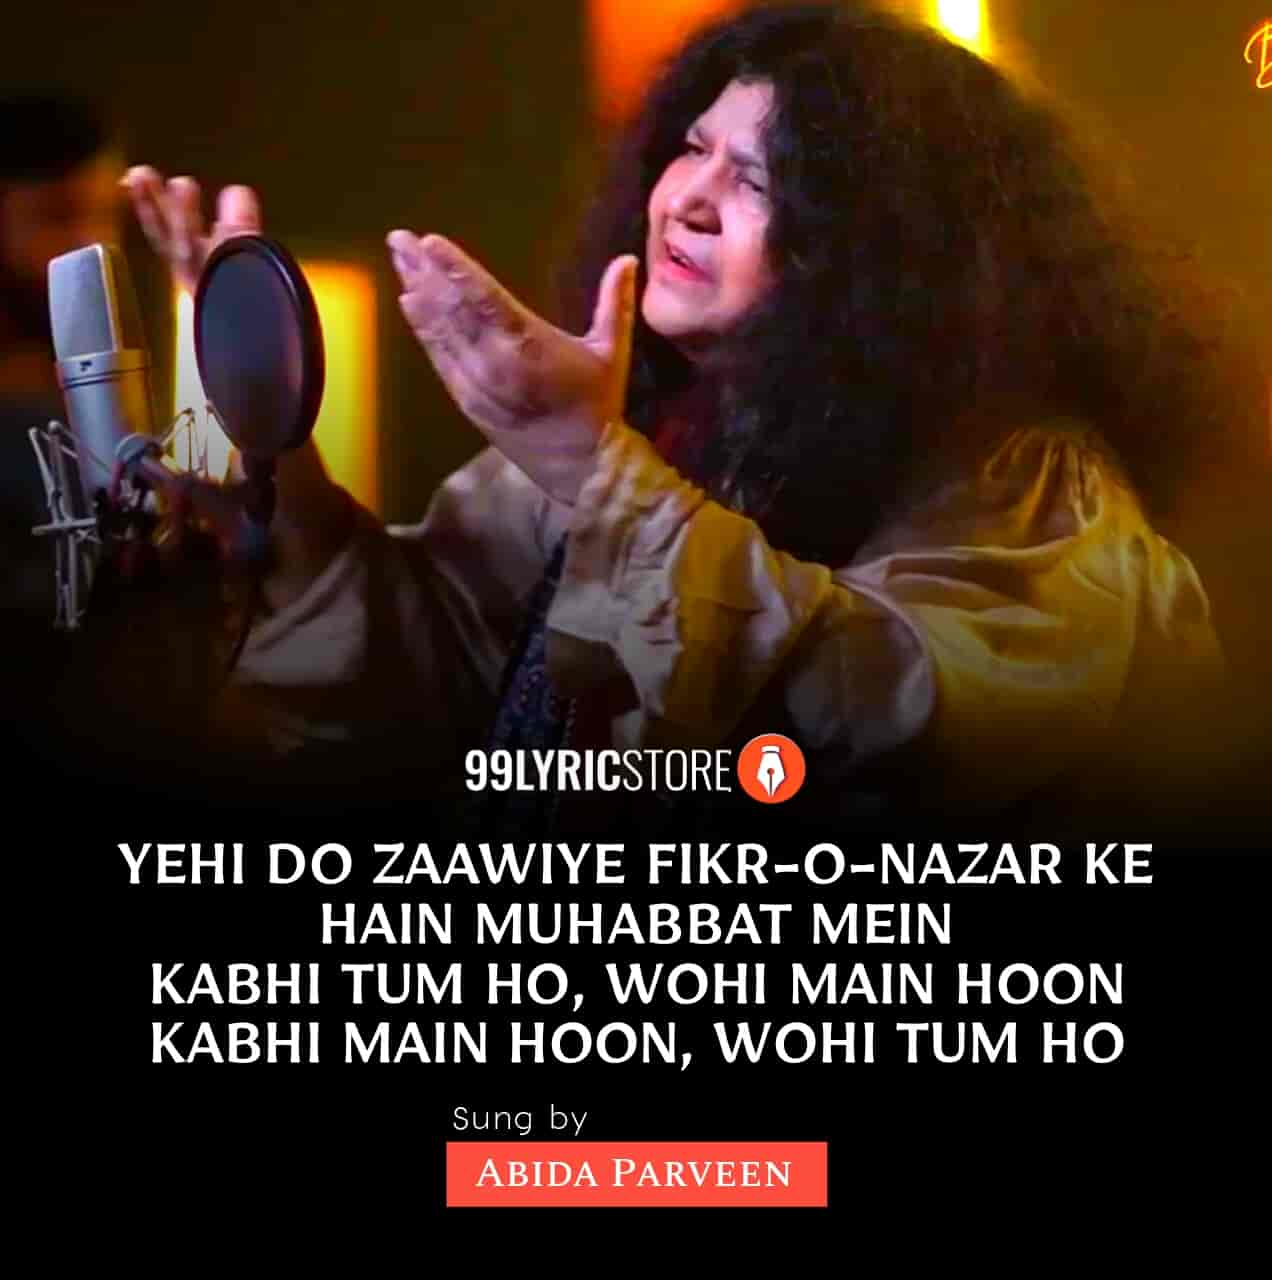 Sarapa Song sung by Abida Parveen